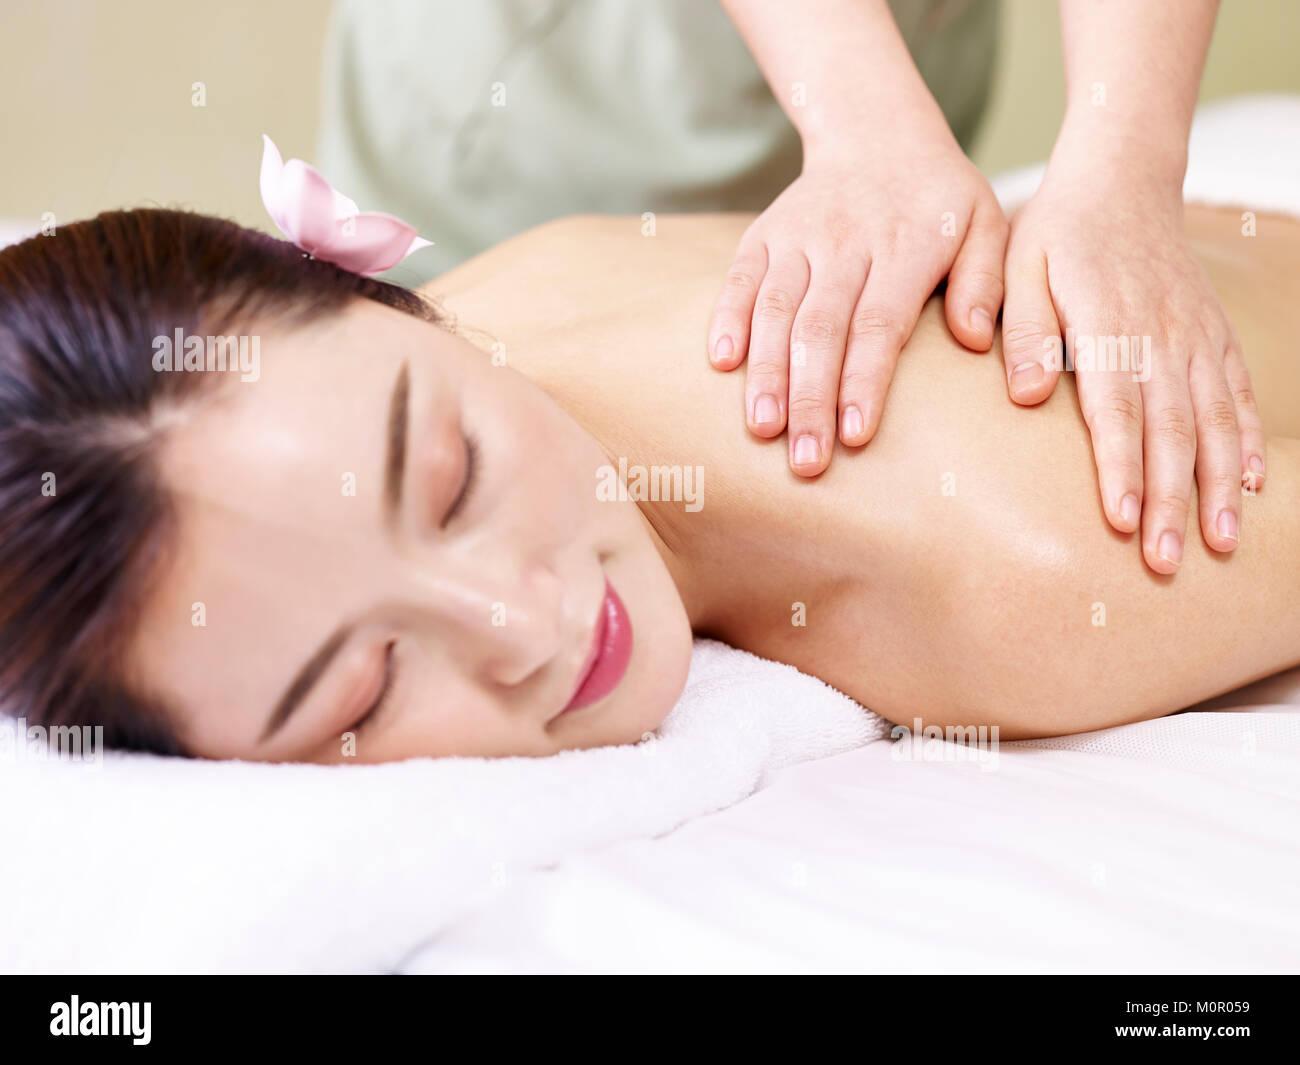 Asian Massage Parlour Stock Photos Asian Massage Parlour Stock